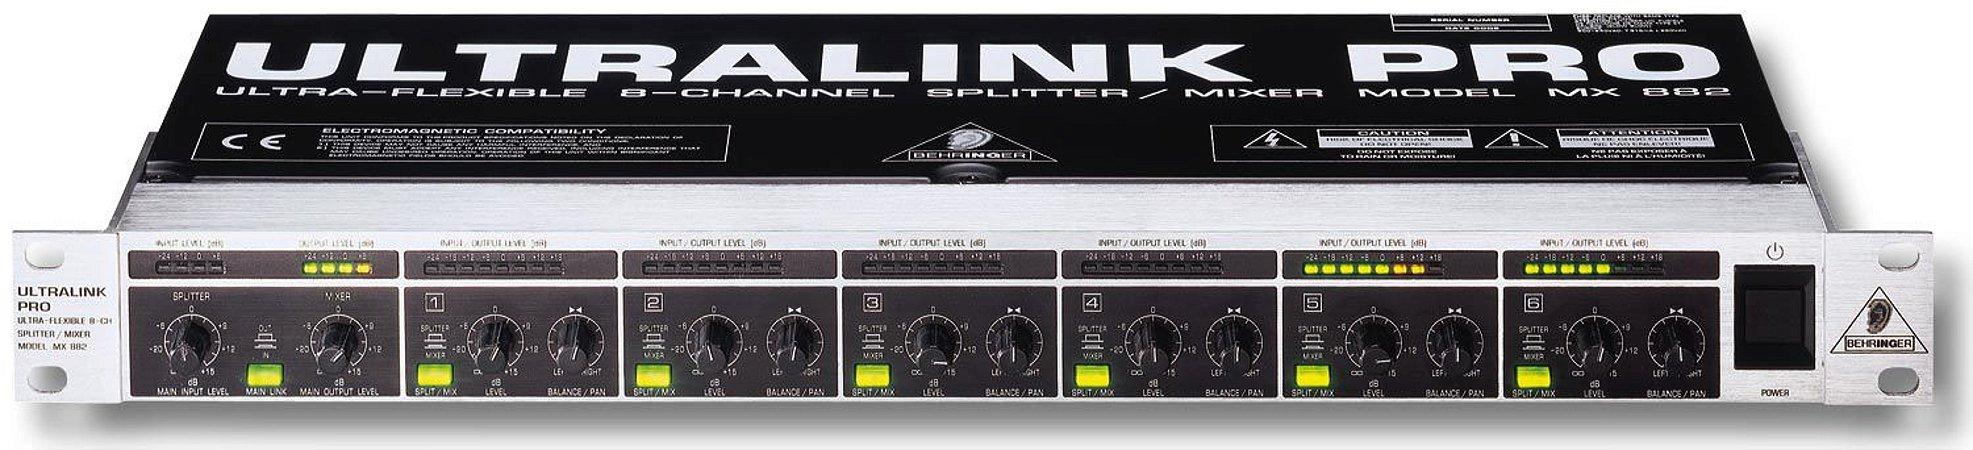 PERIF. BEHRINGER LINE MIXER ULTRALINK MX882